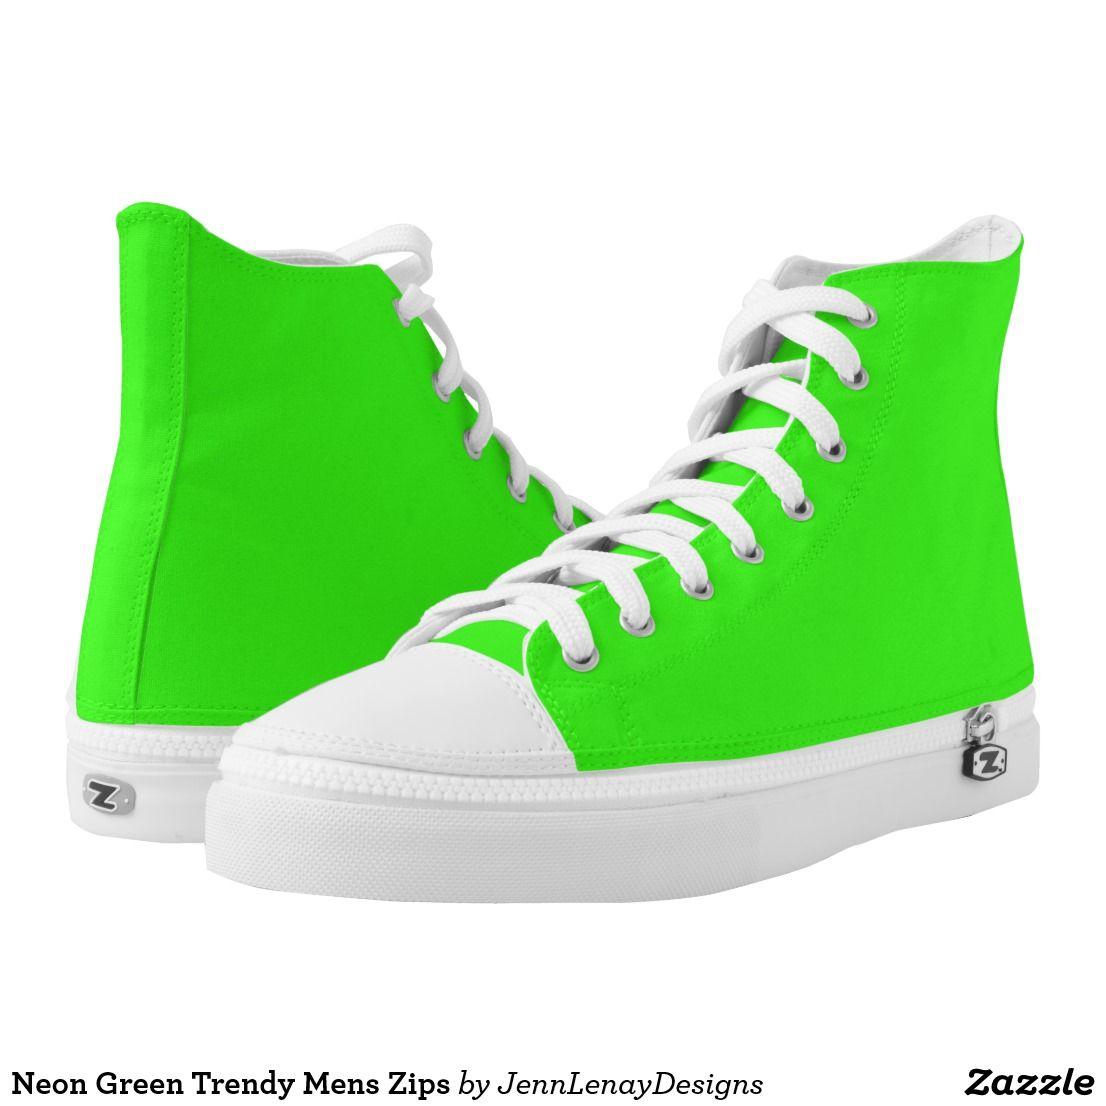 Neon Lime Green Trendy Mens Zips High